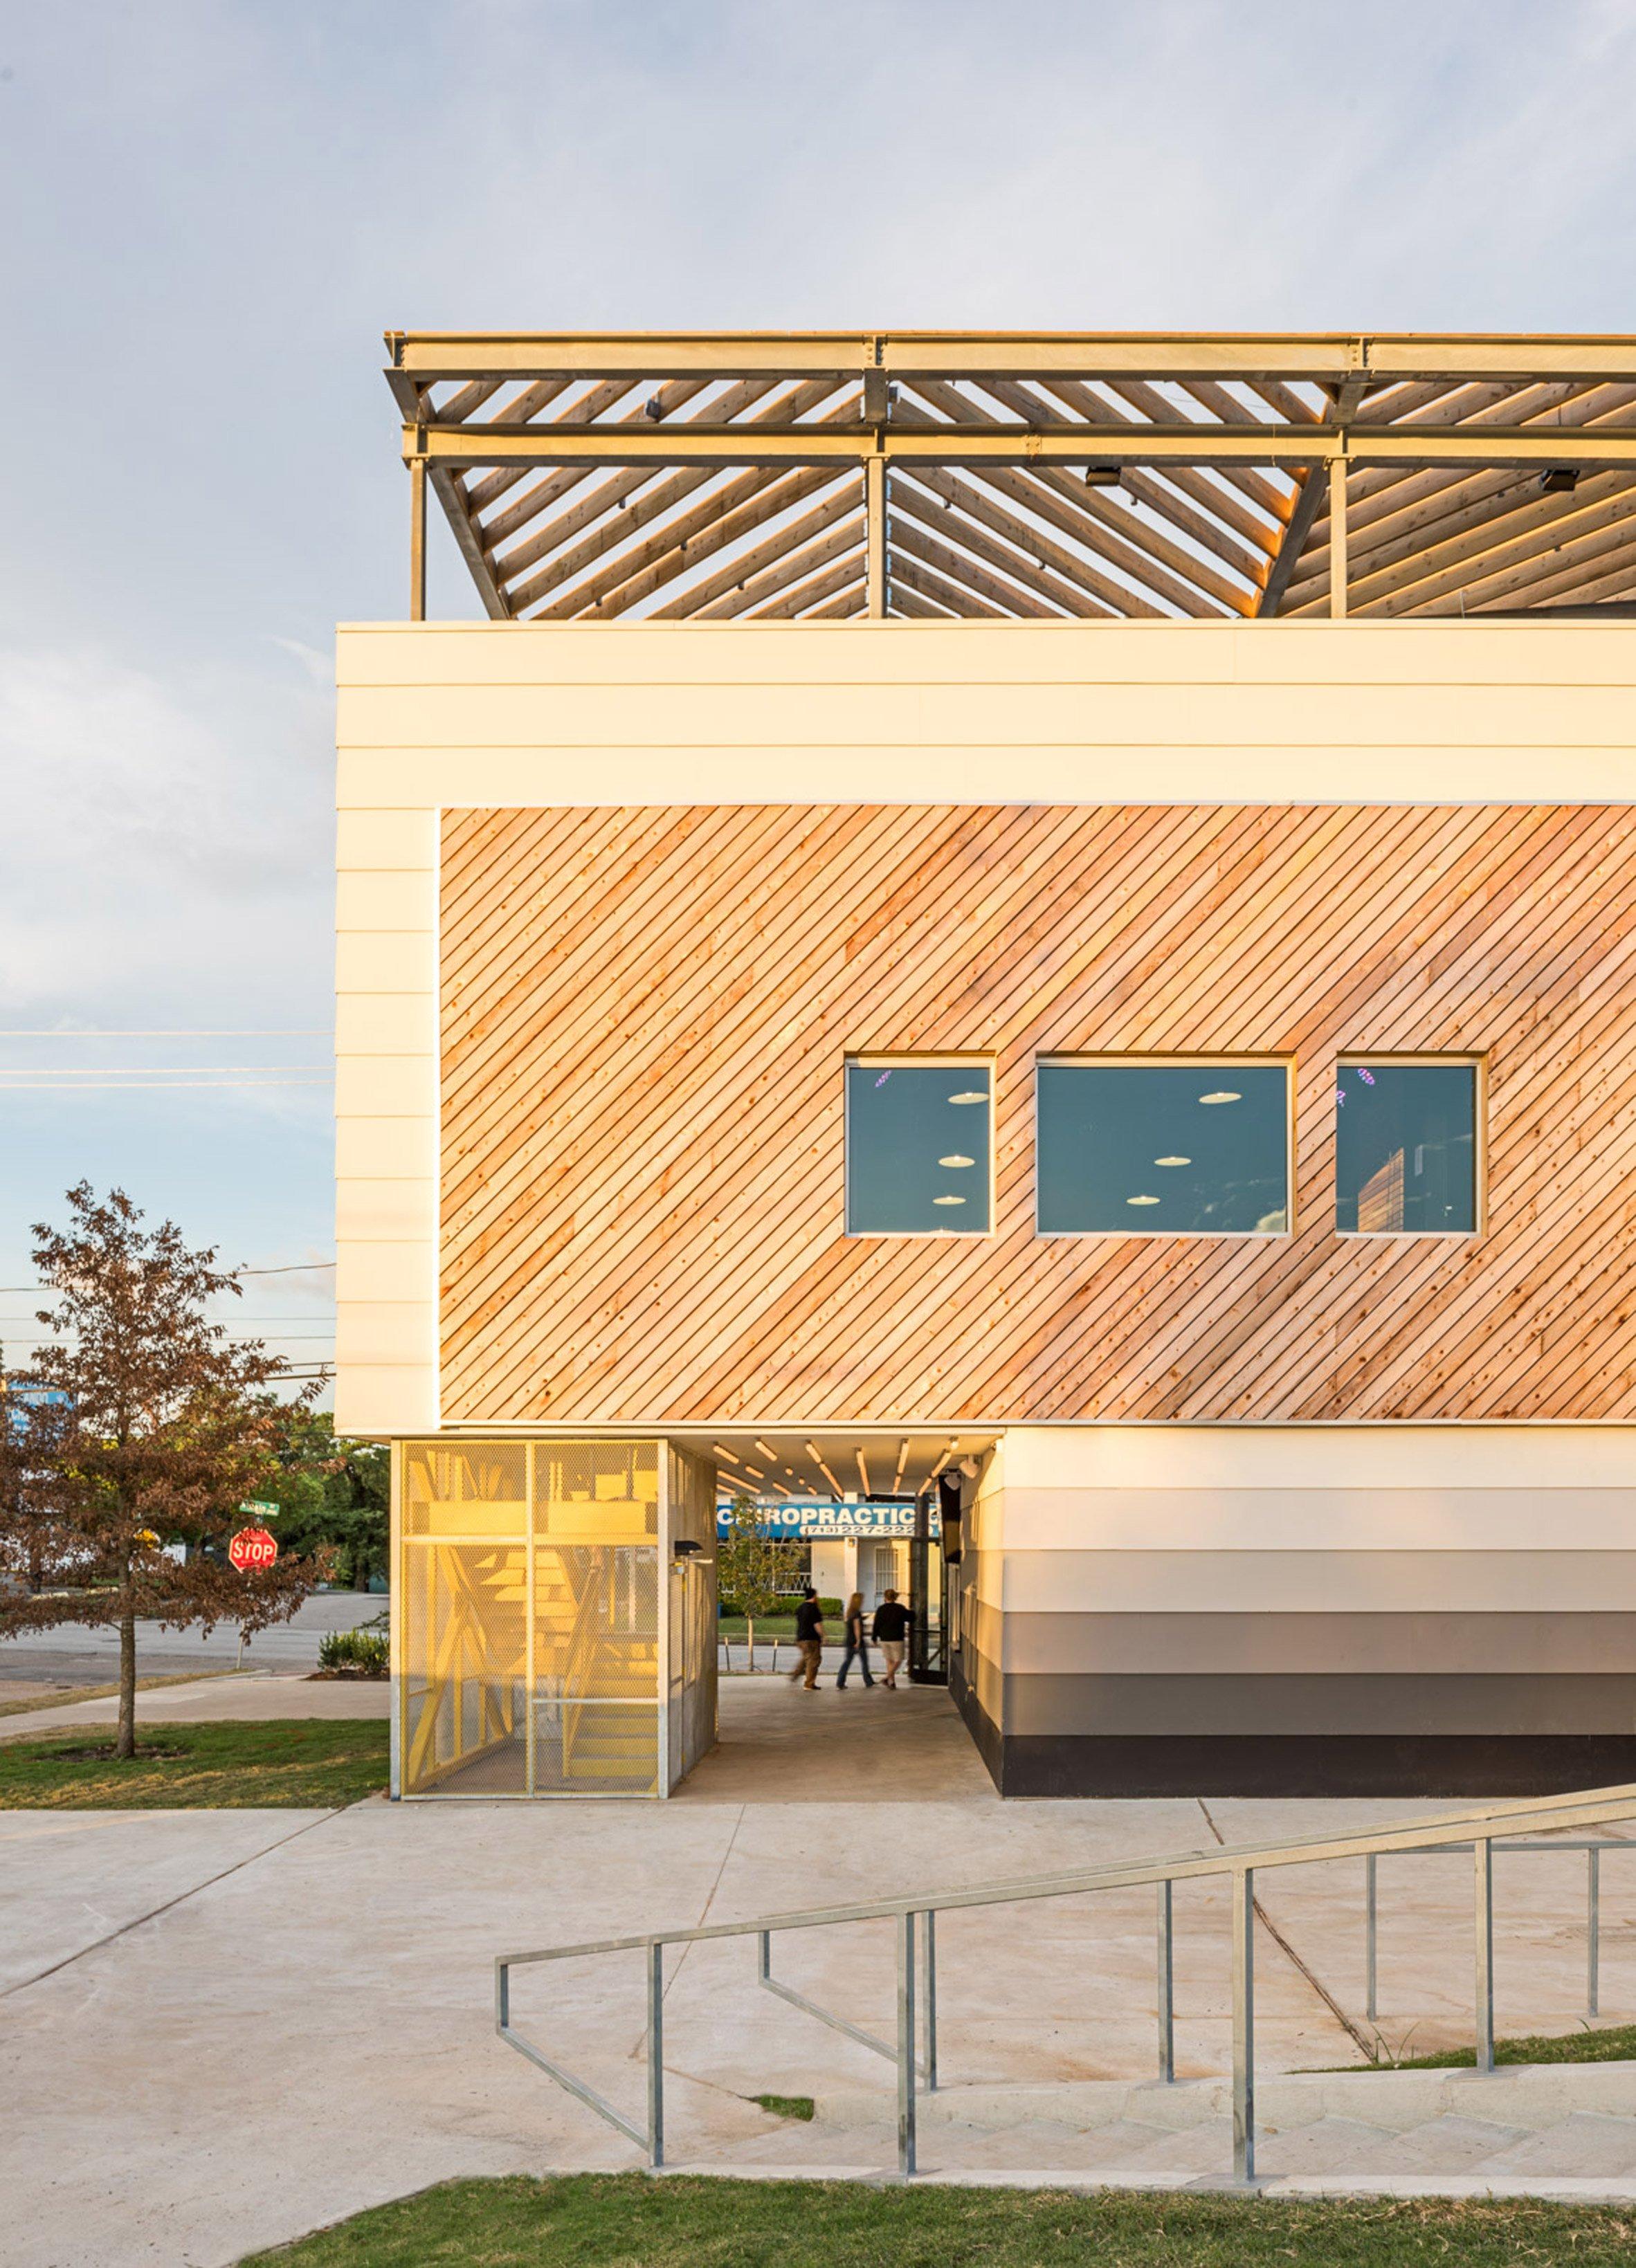 White Oak Music Hall by Schaum/Shieh